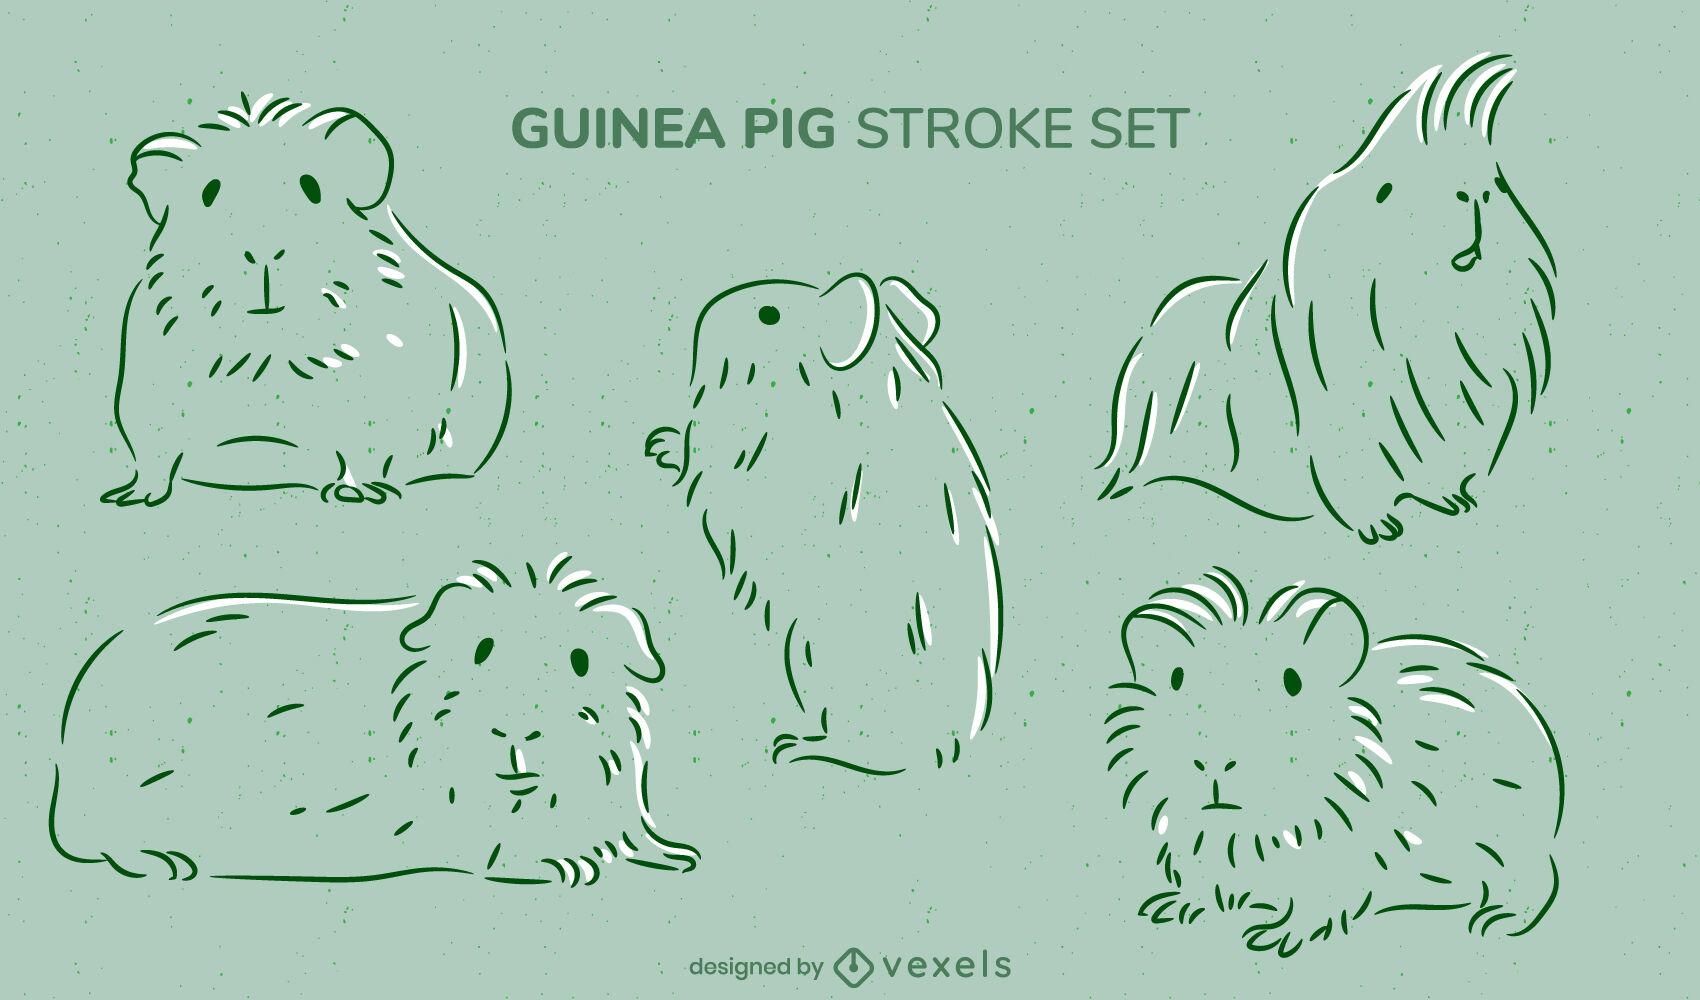 Conjunto de golpes de animais roedores cobaias